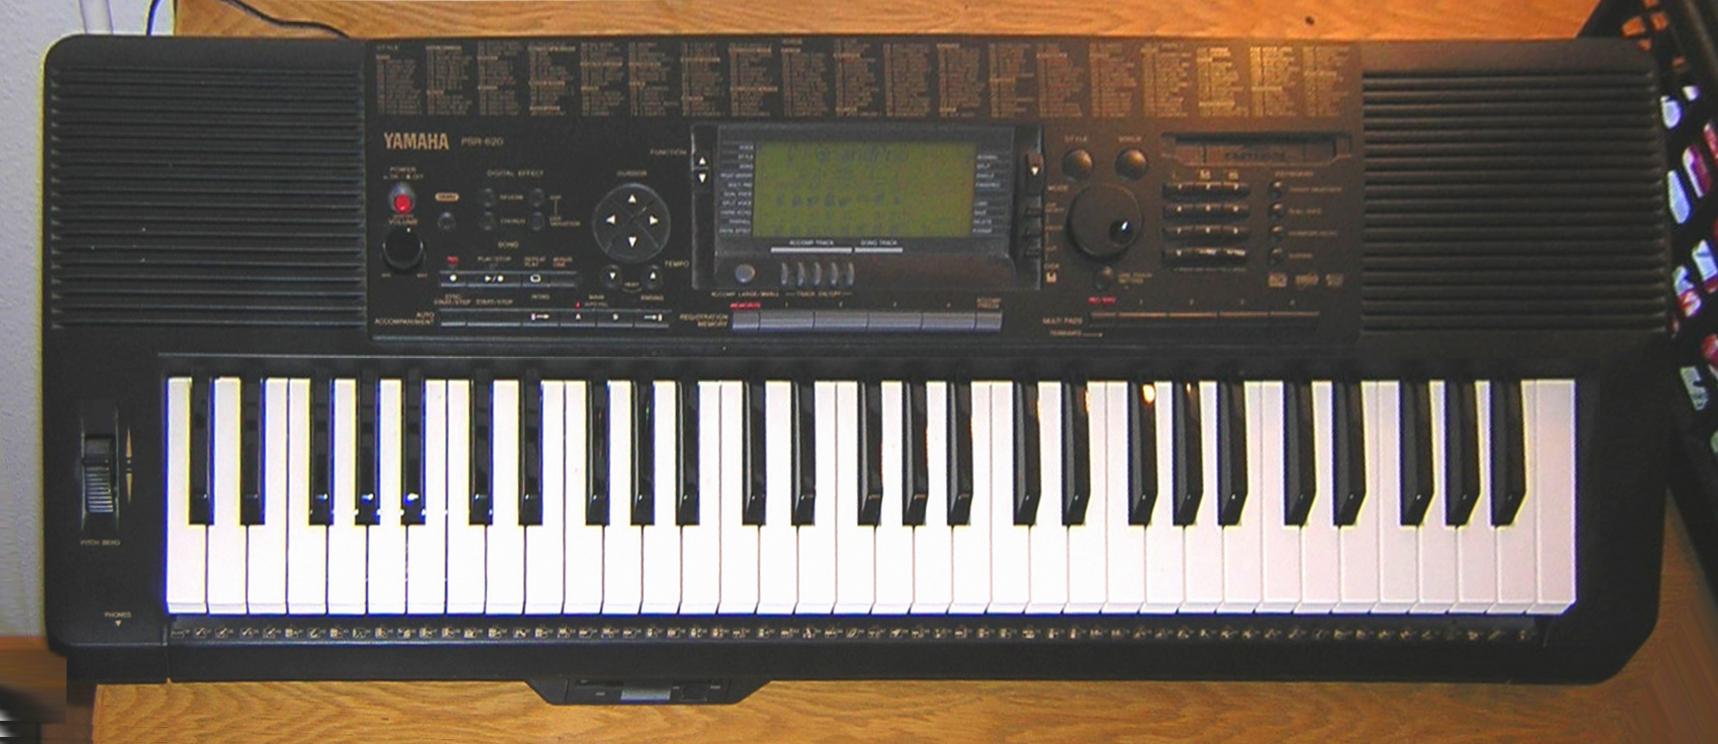 Yamaha E Keyboard Review